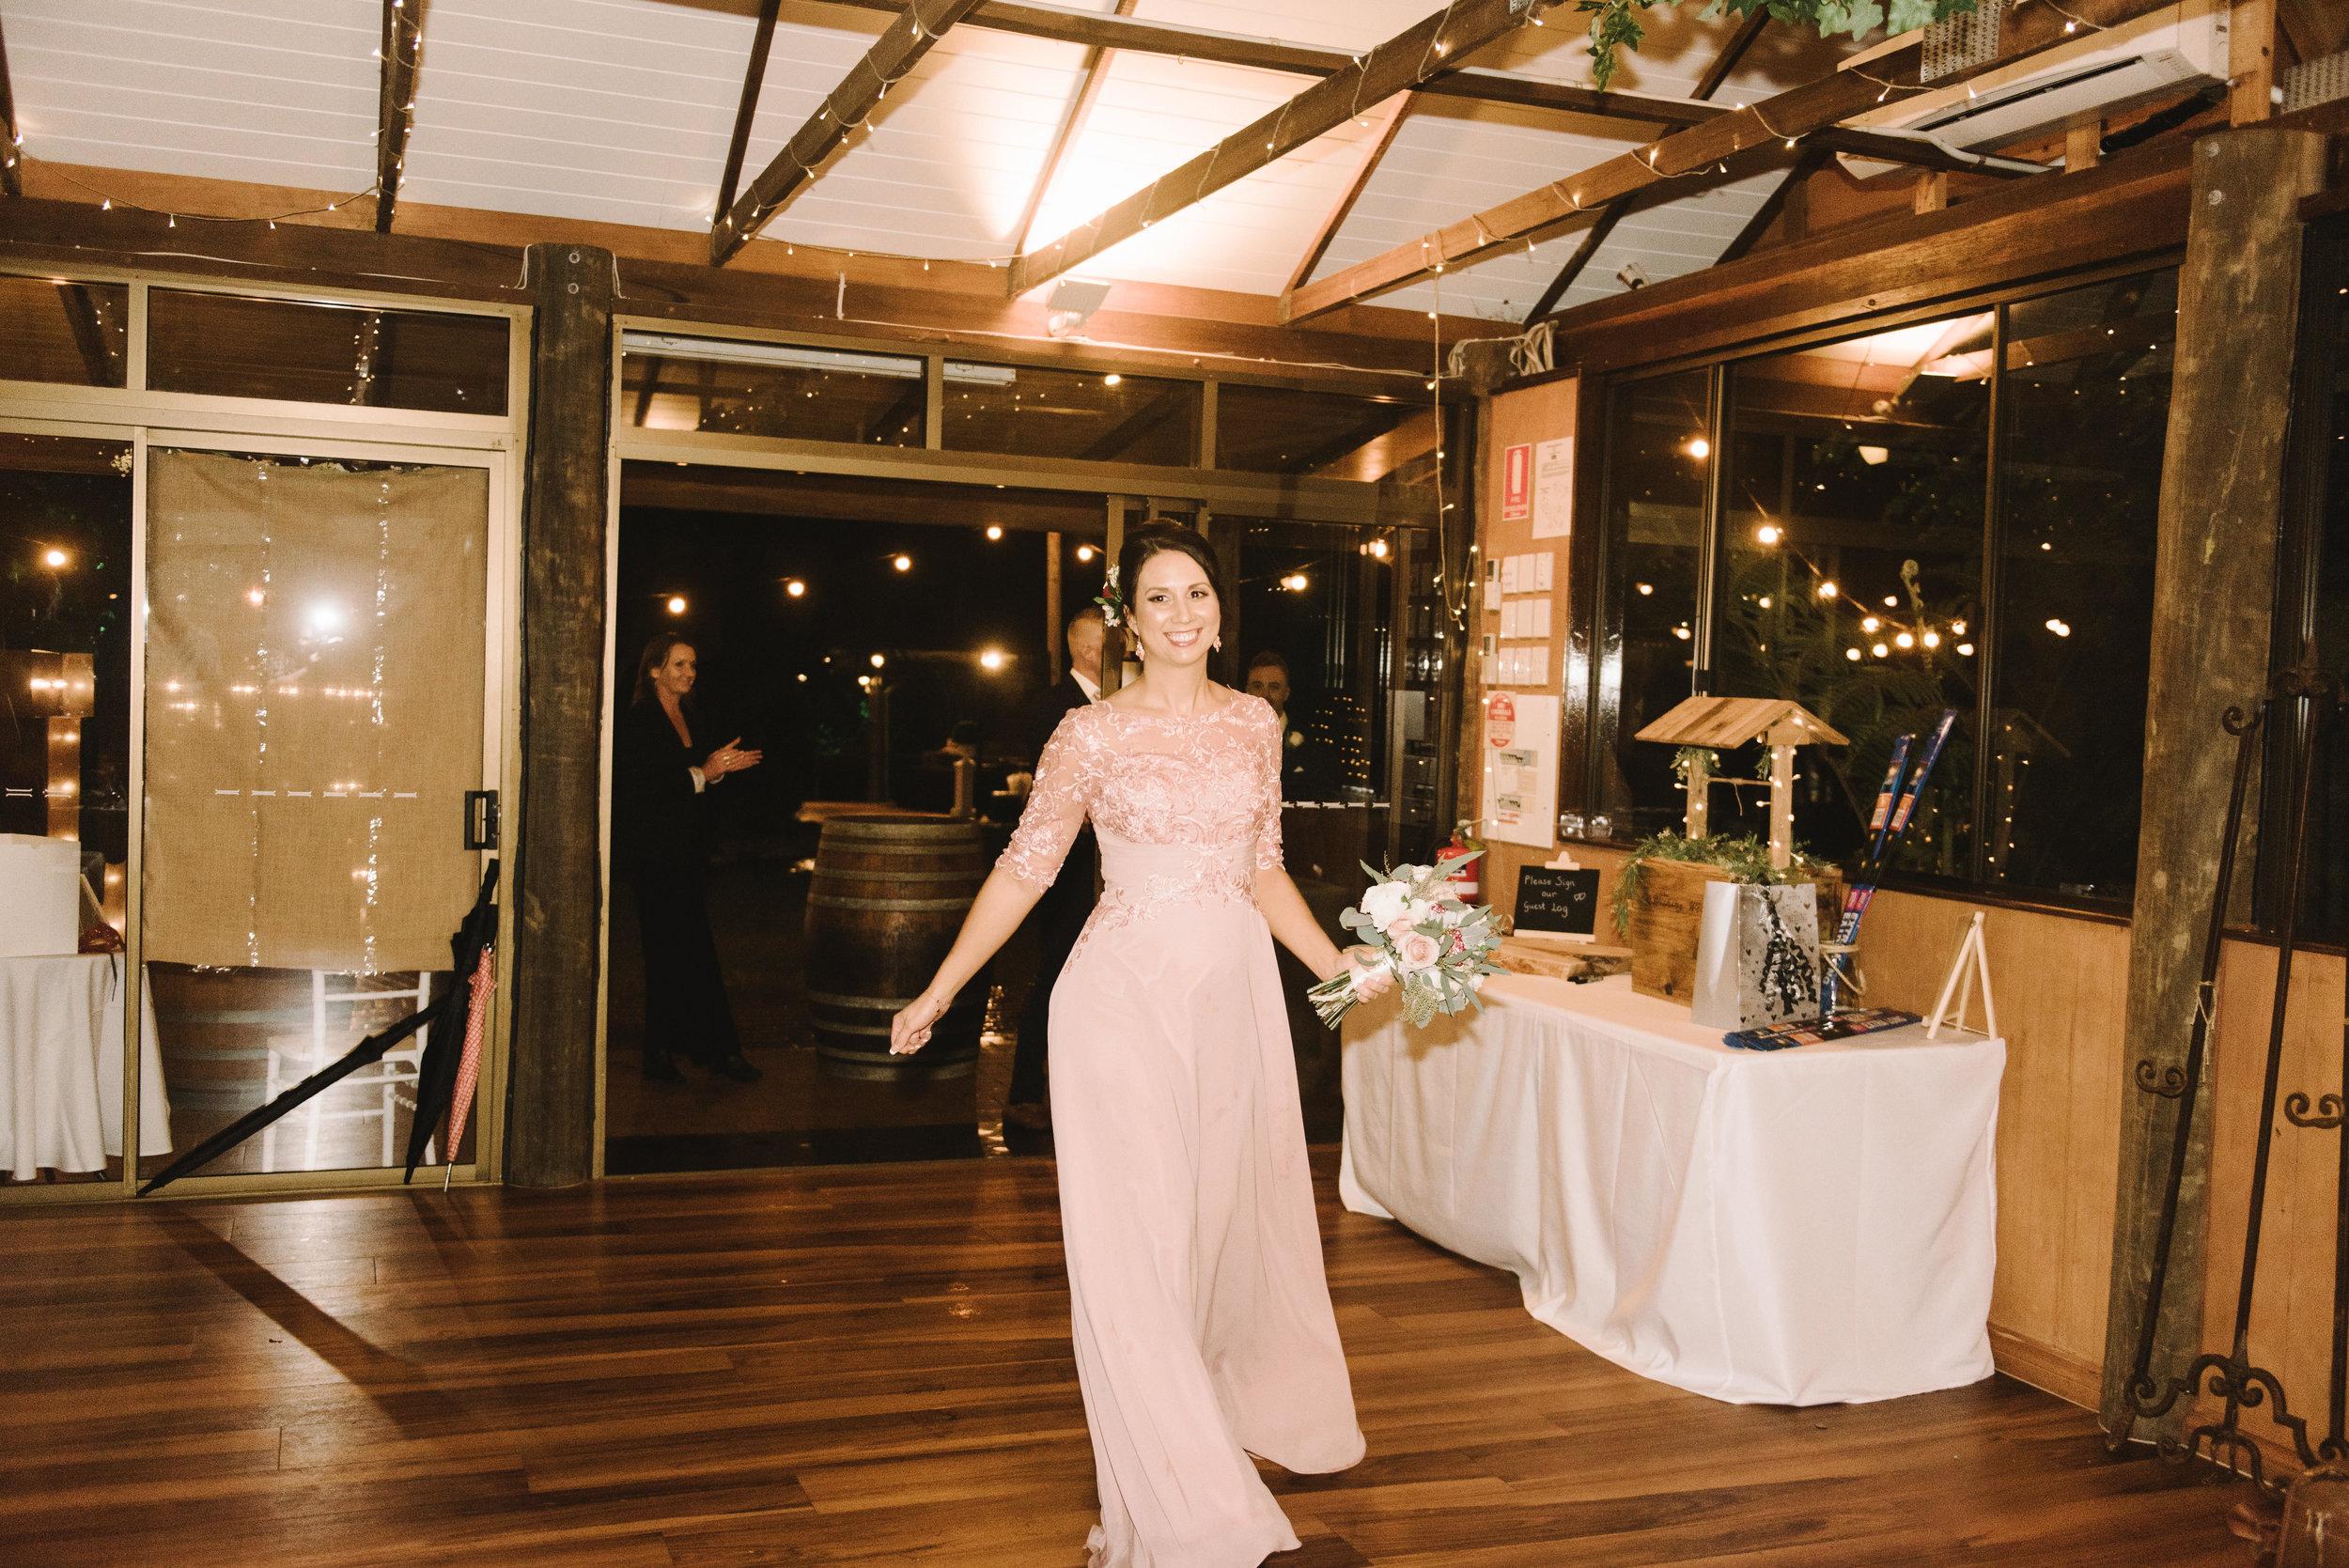 brisbane-gold-coast-sunshine-coast-romantic-wedding-photographer-78.jpg